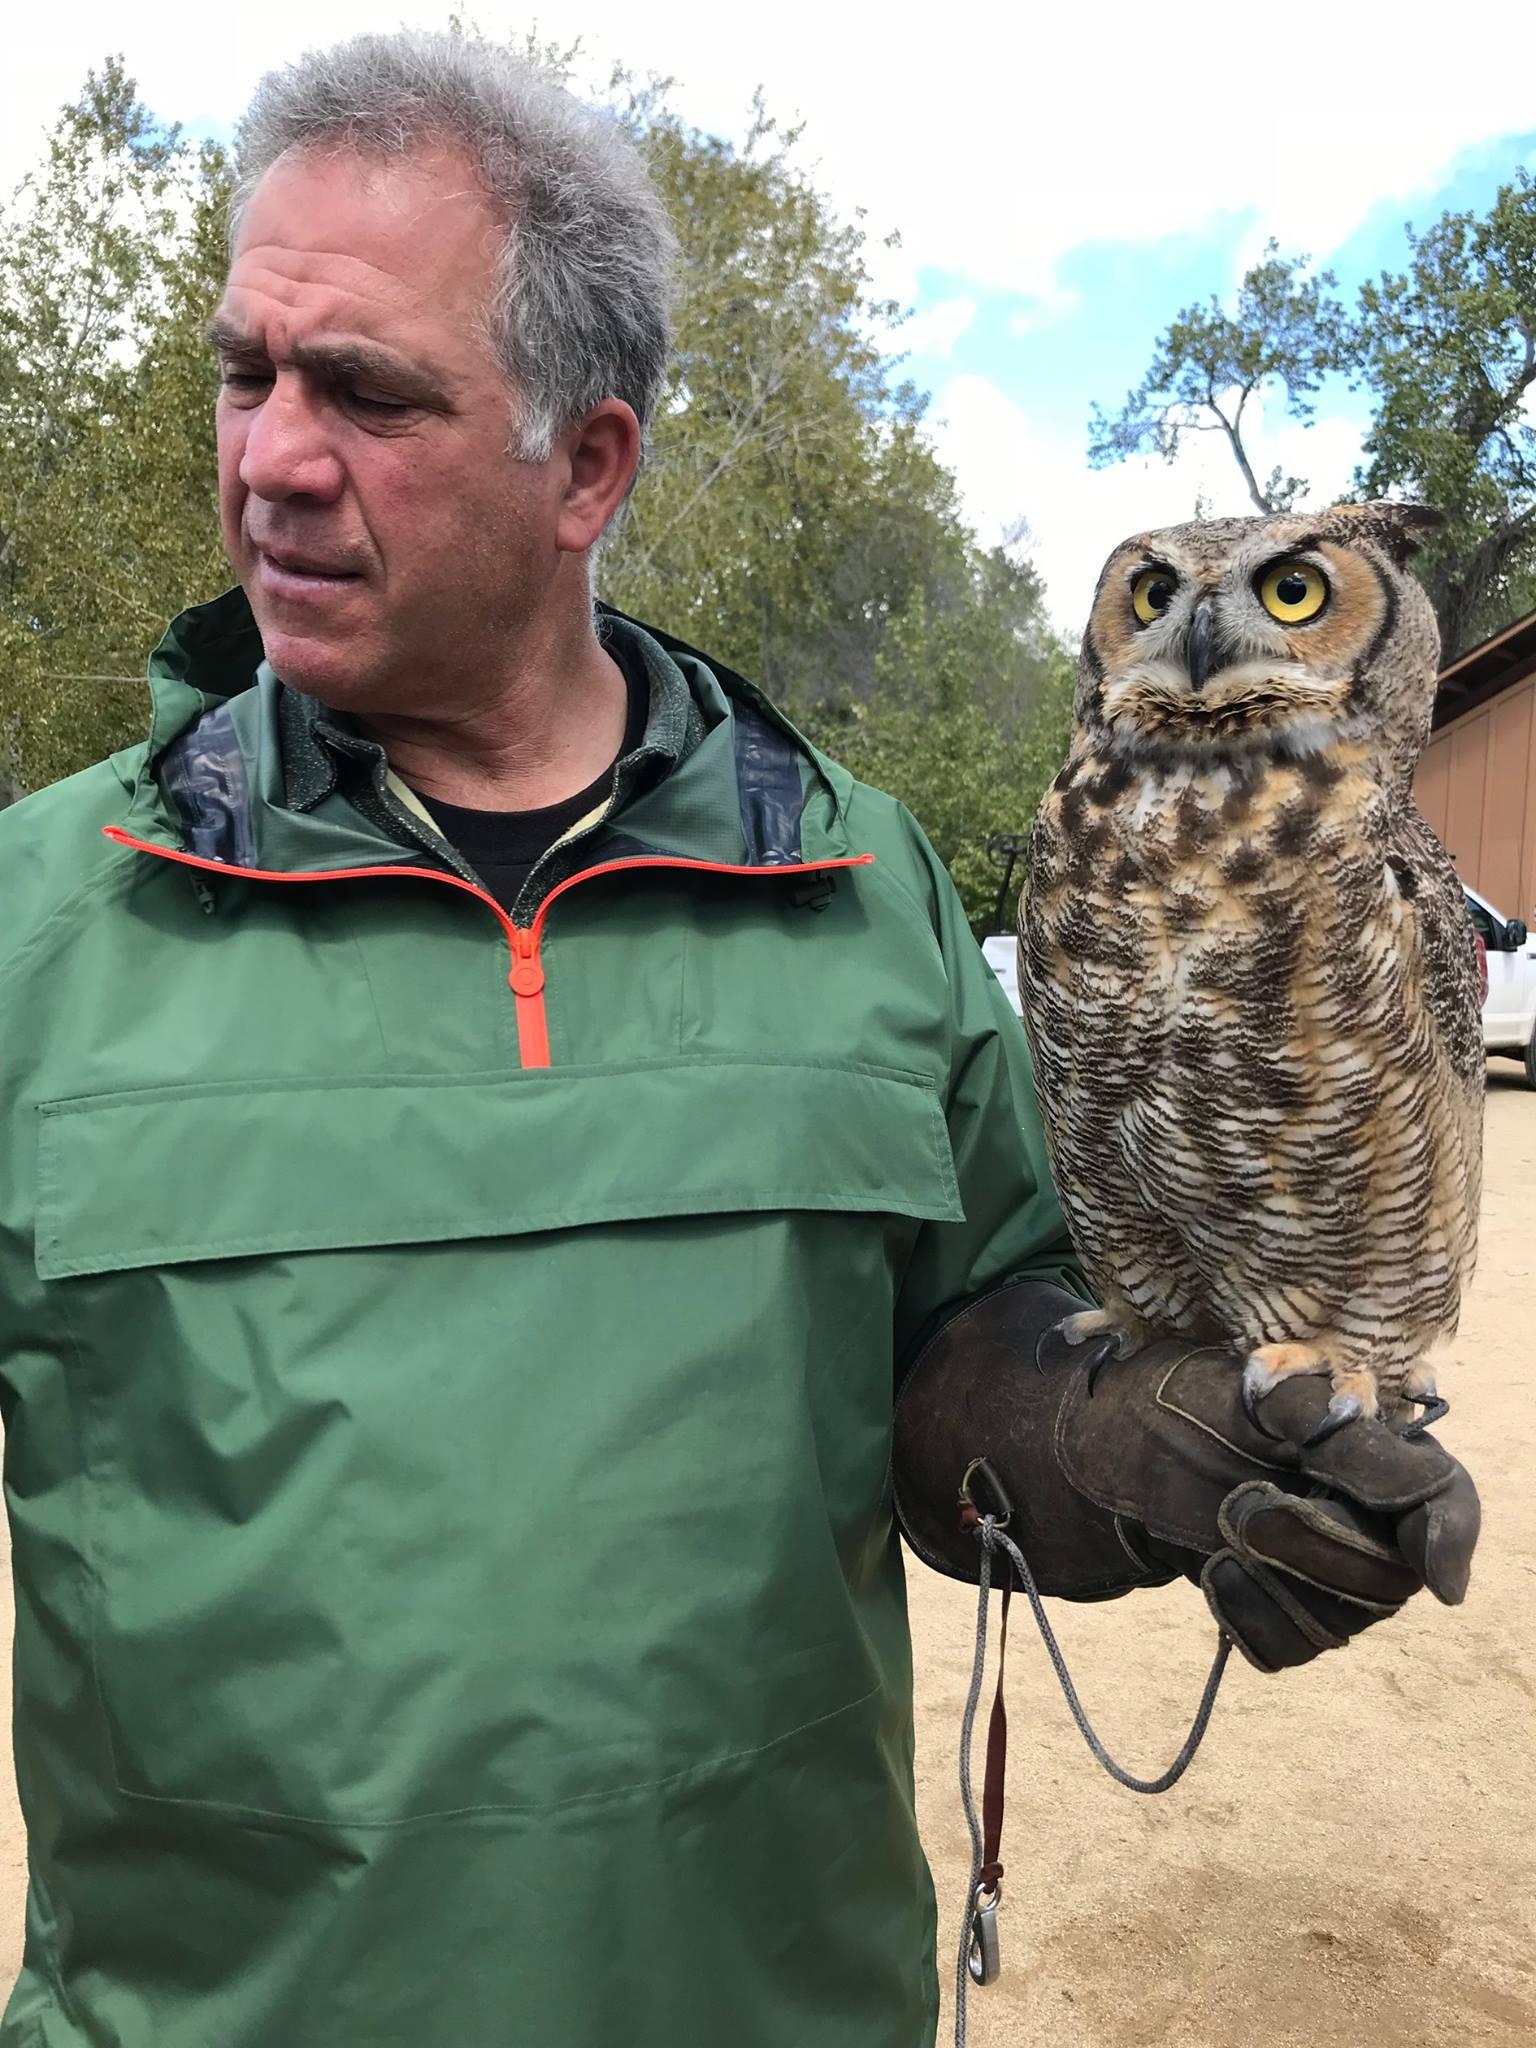 Antonio Belestreri with a Great-Horned Owl